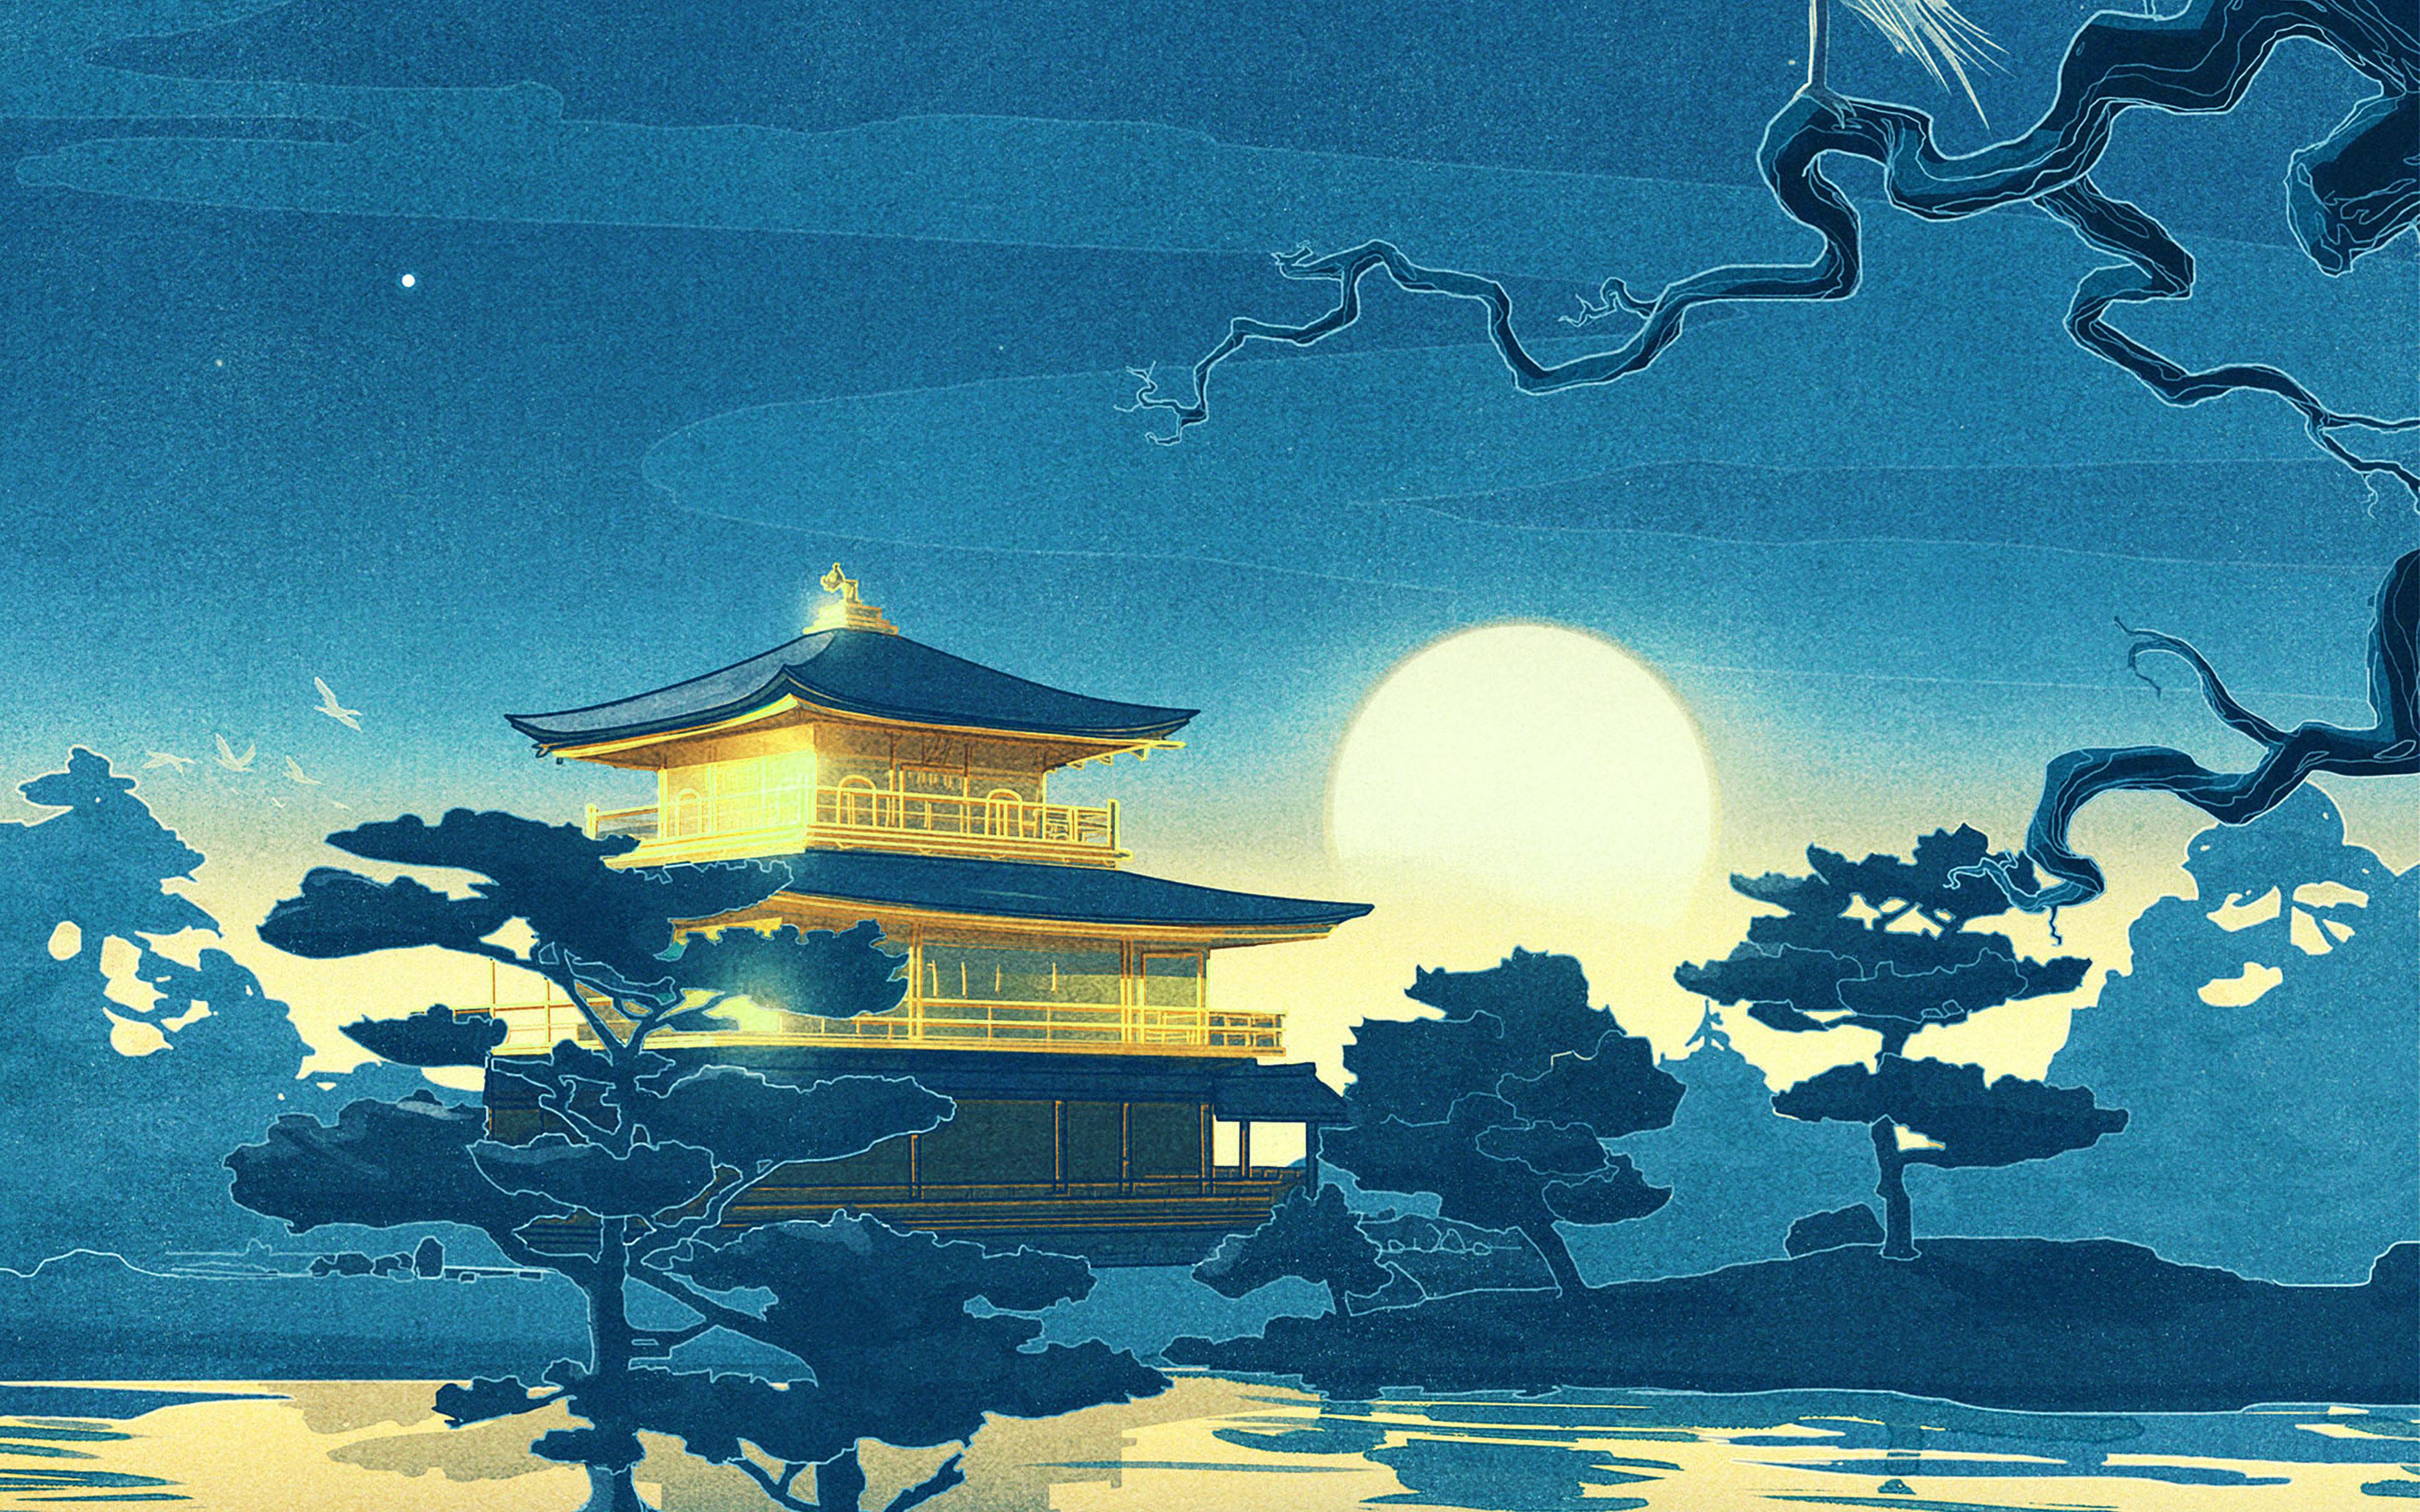 ab43-wallpaper-slumber-blue-art-illust - Papers.co